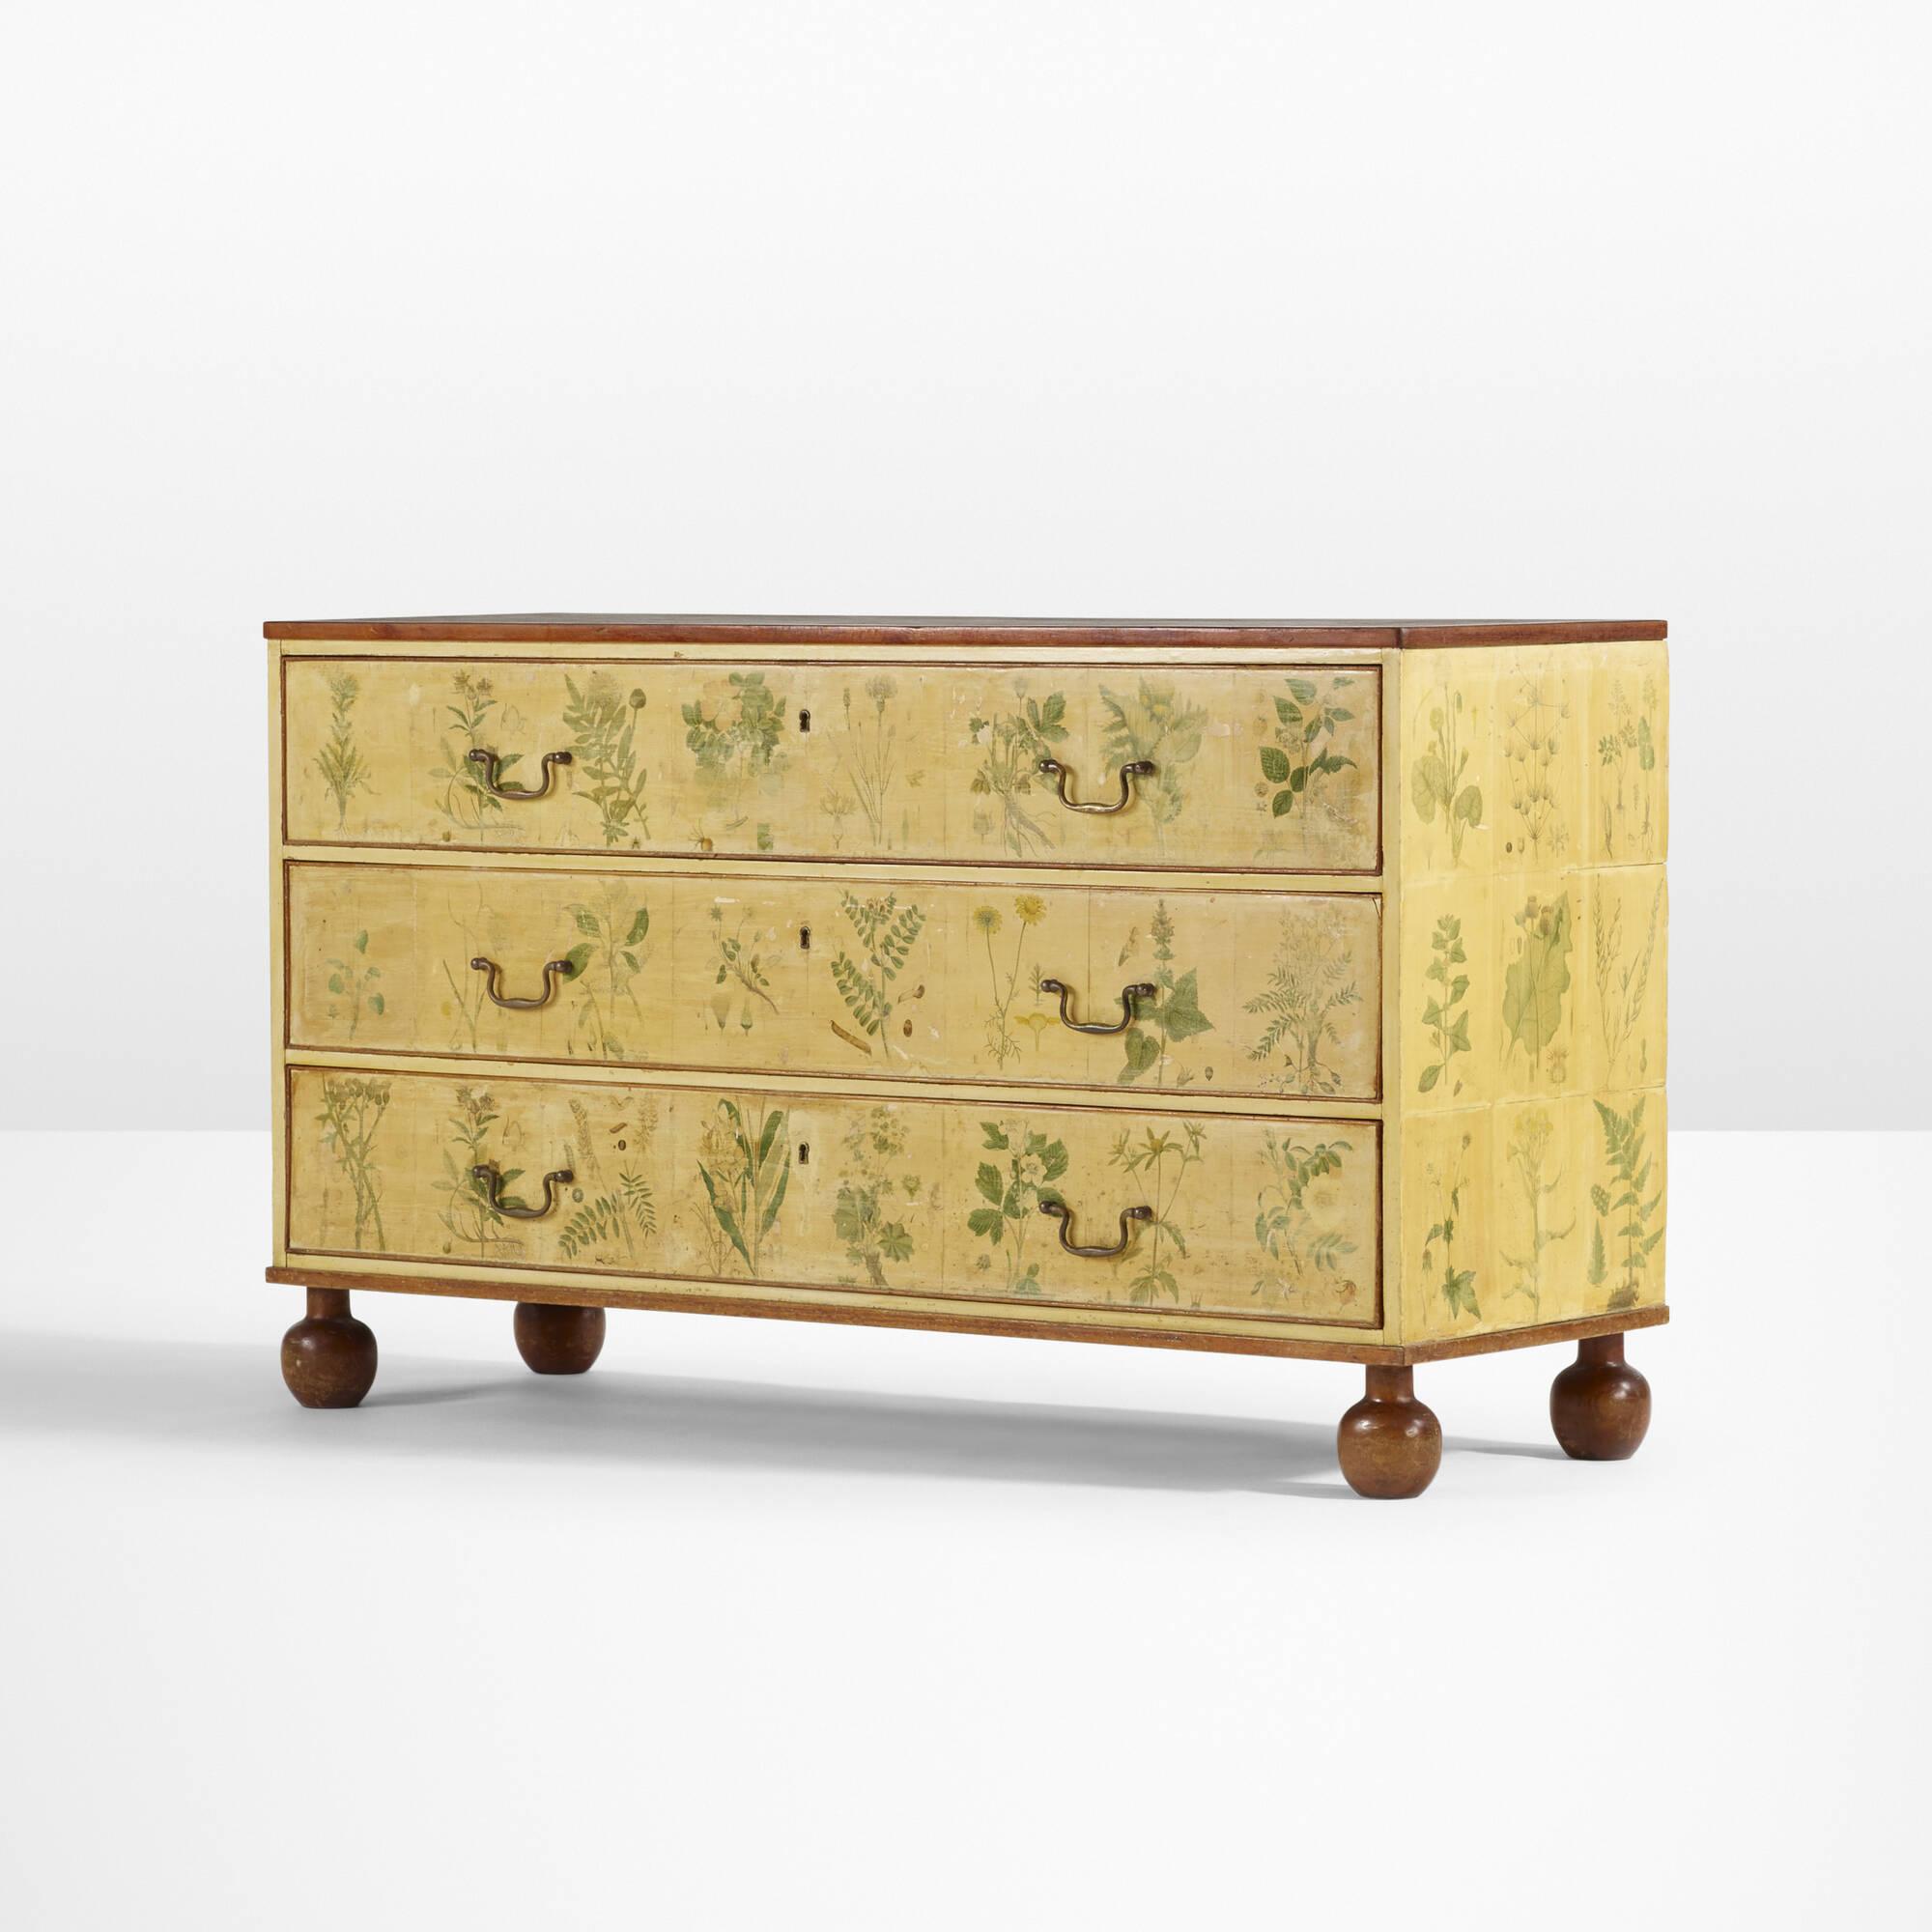 20: Josef Frank / Important Flora cabinet (1 of 4)